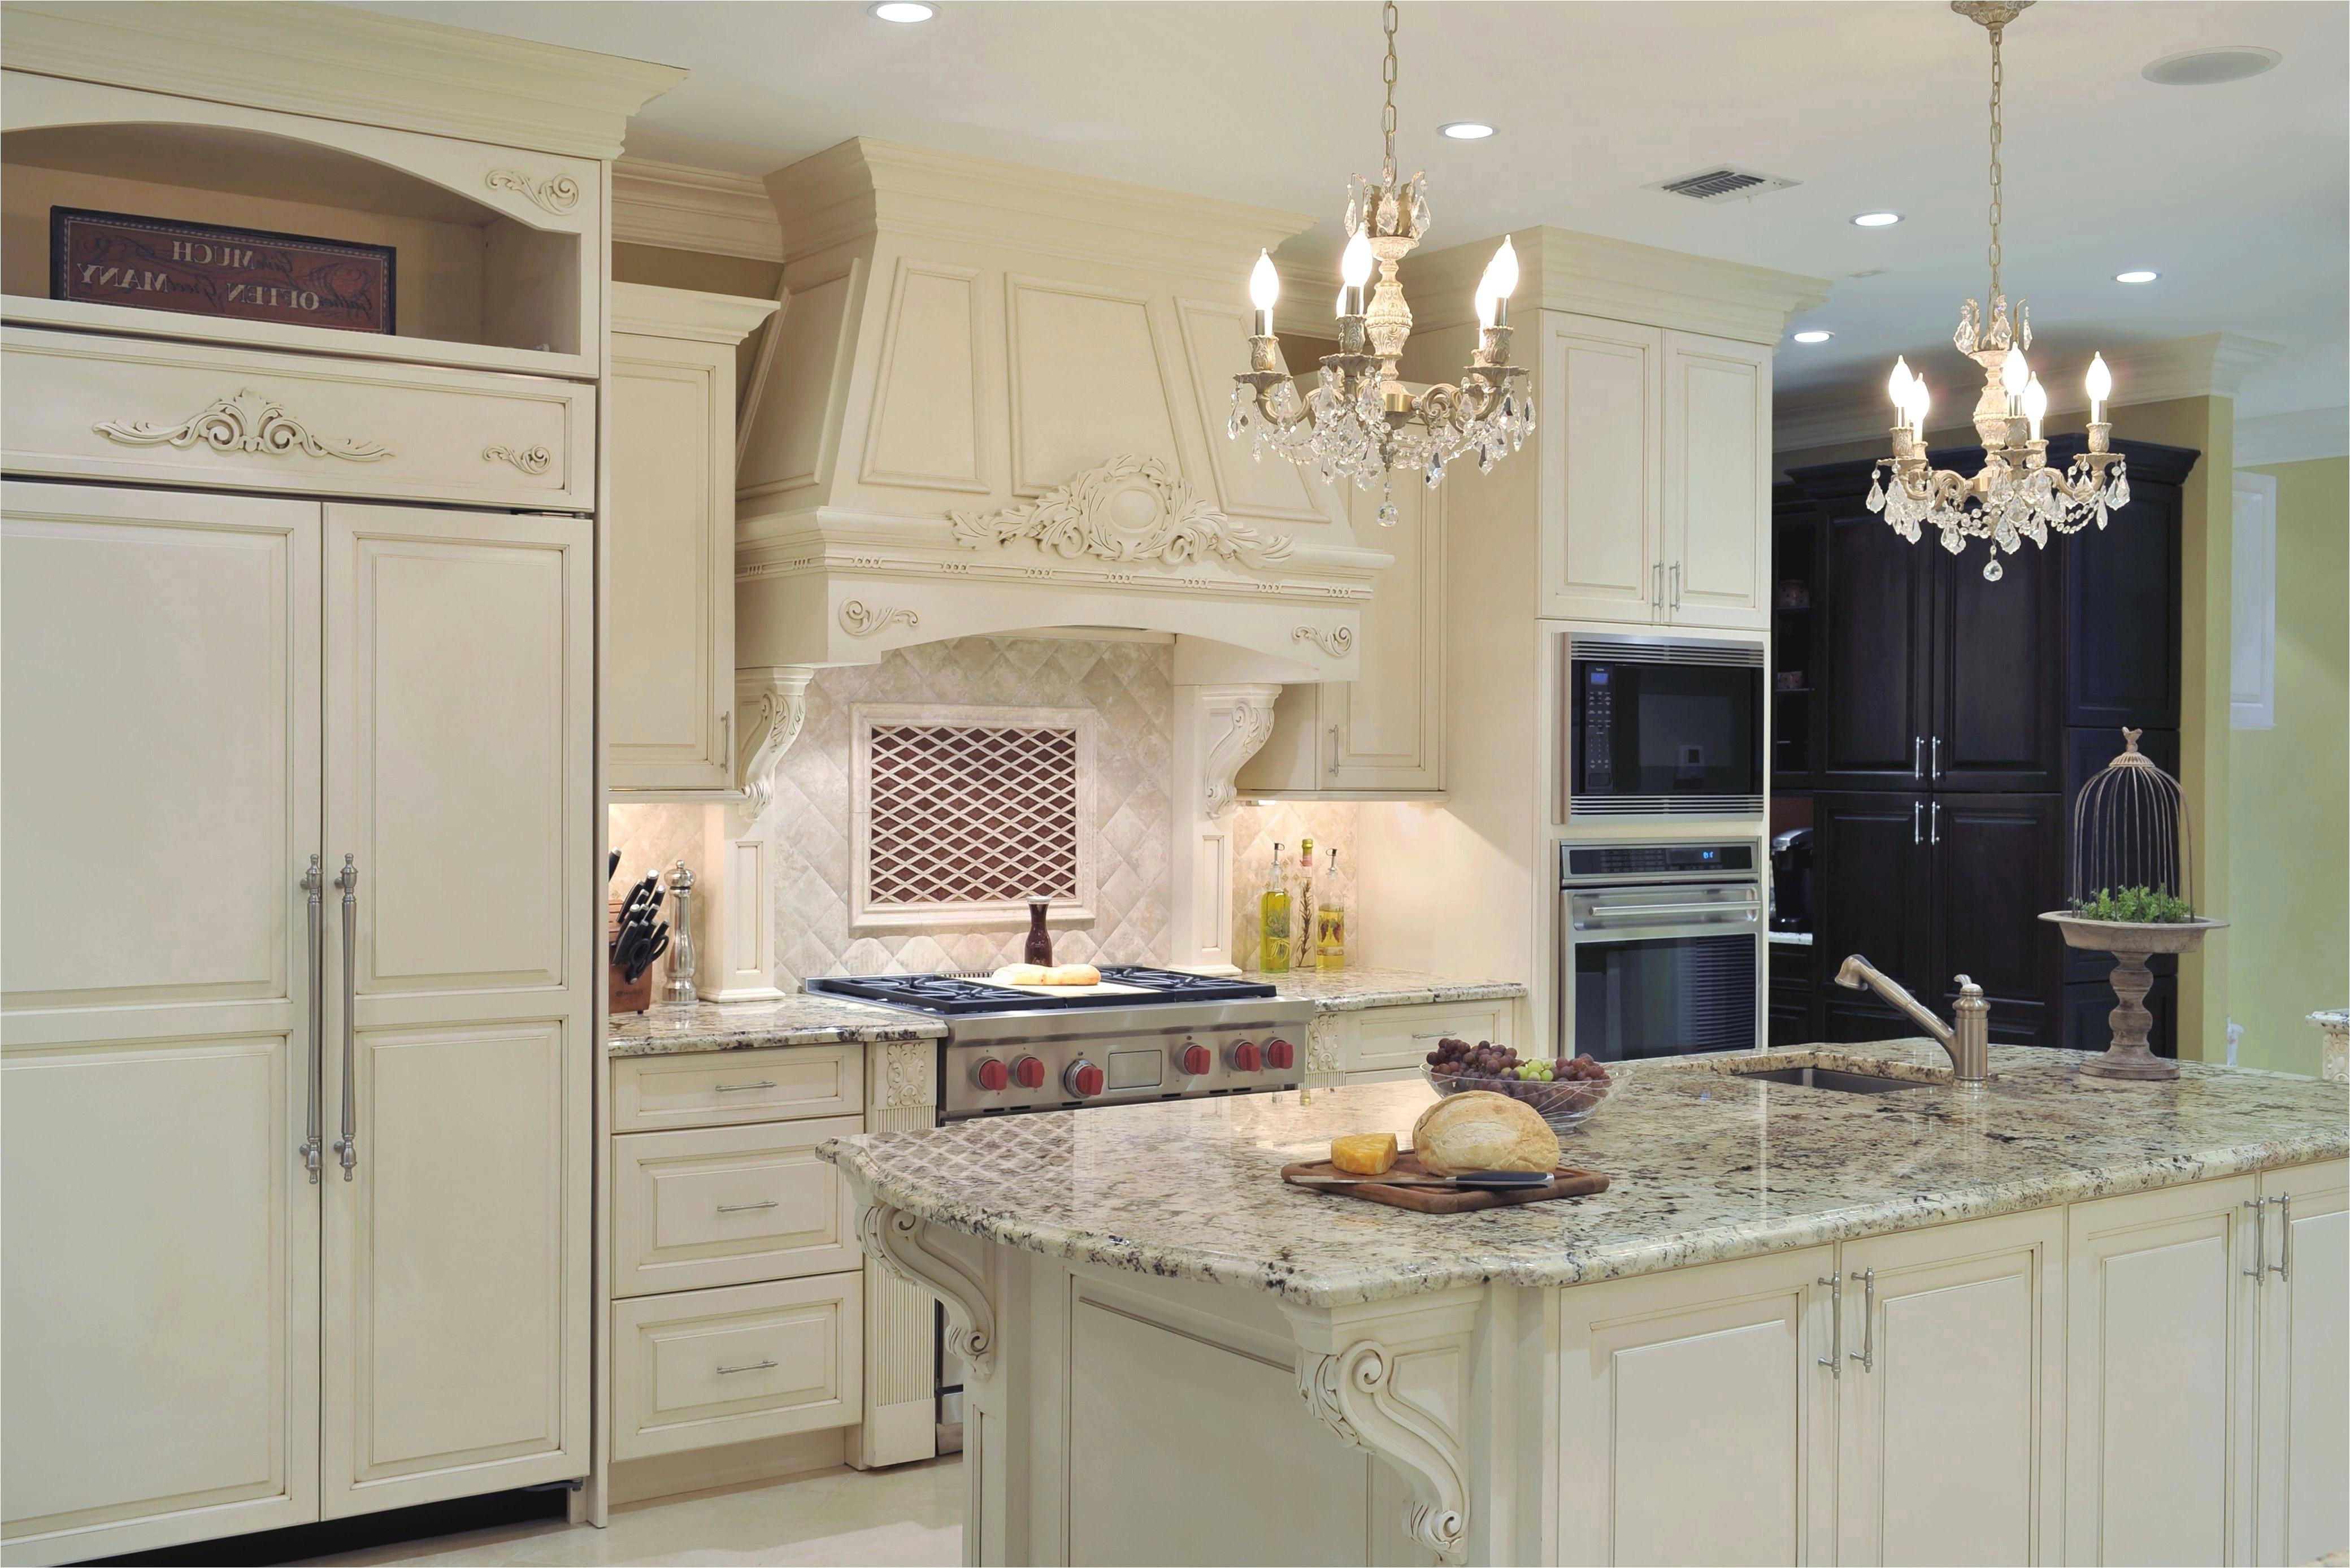 22 elegant hampton bay kitchen cabinets s home ideas from hampton bay kitchen cabinets image source beautyandtheminibeasts com